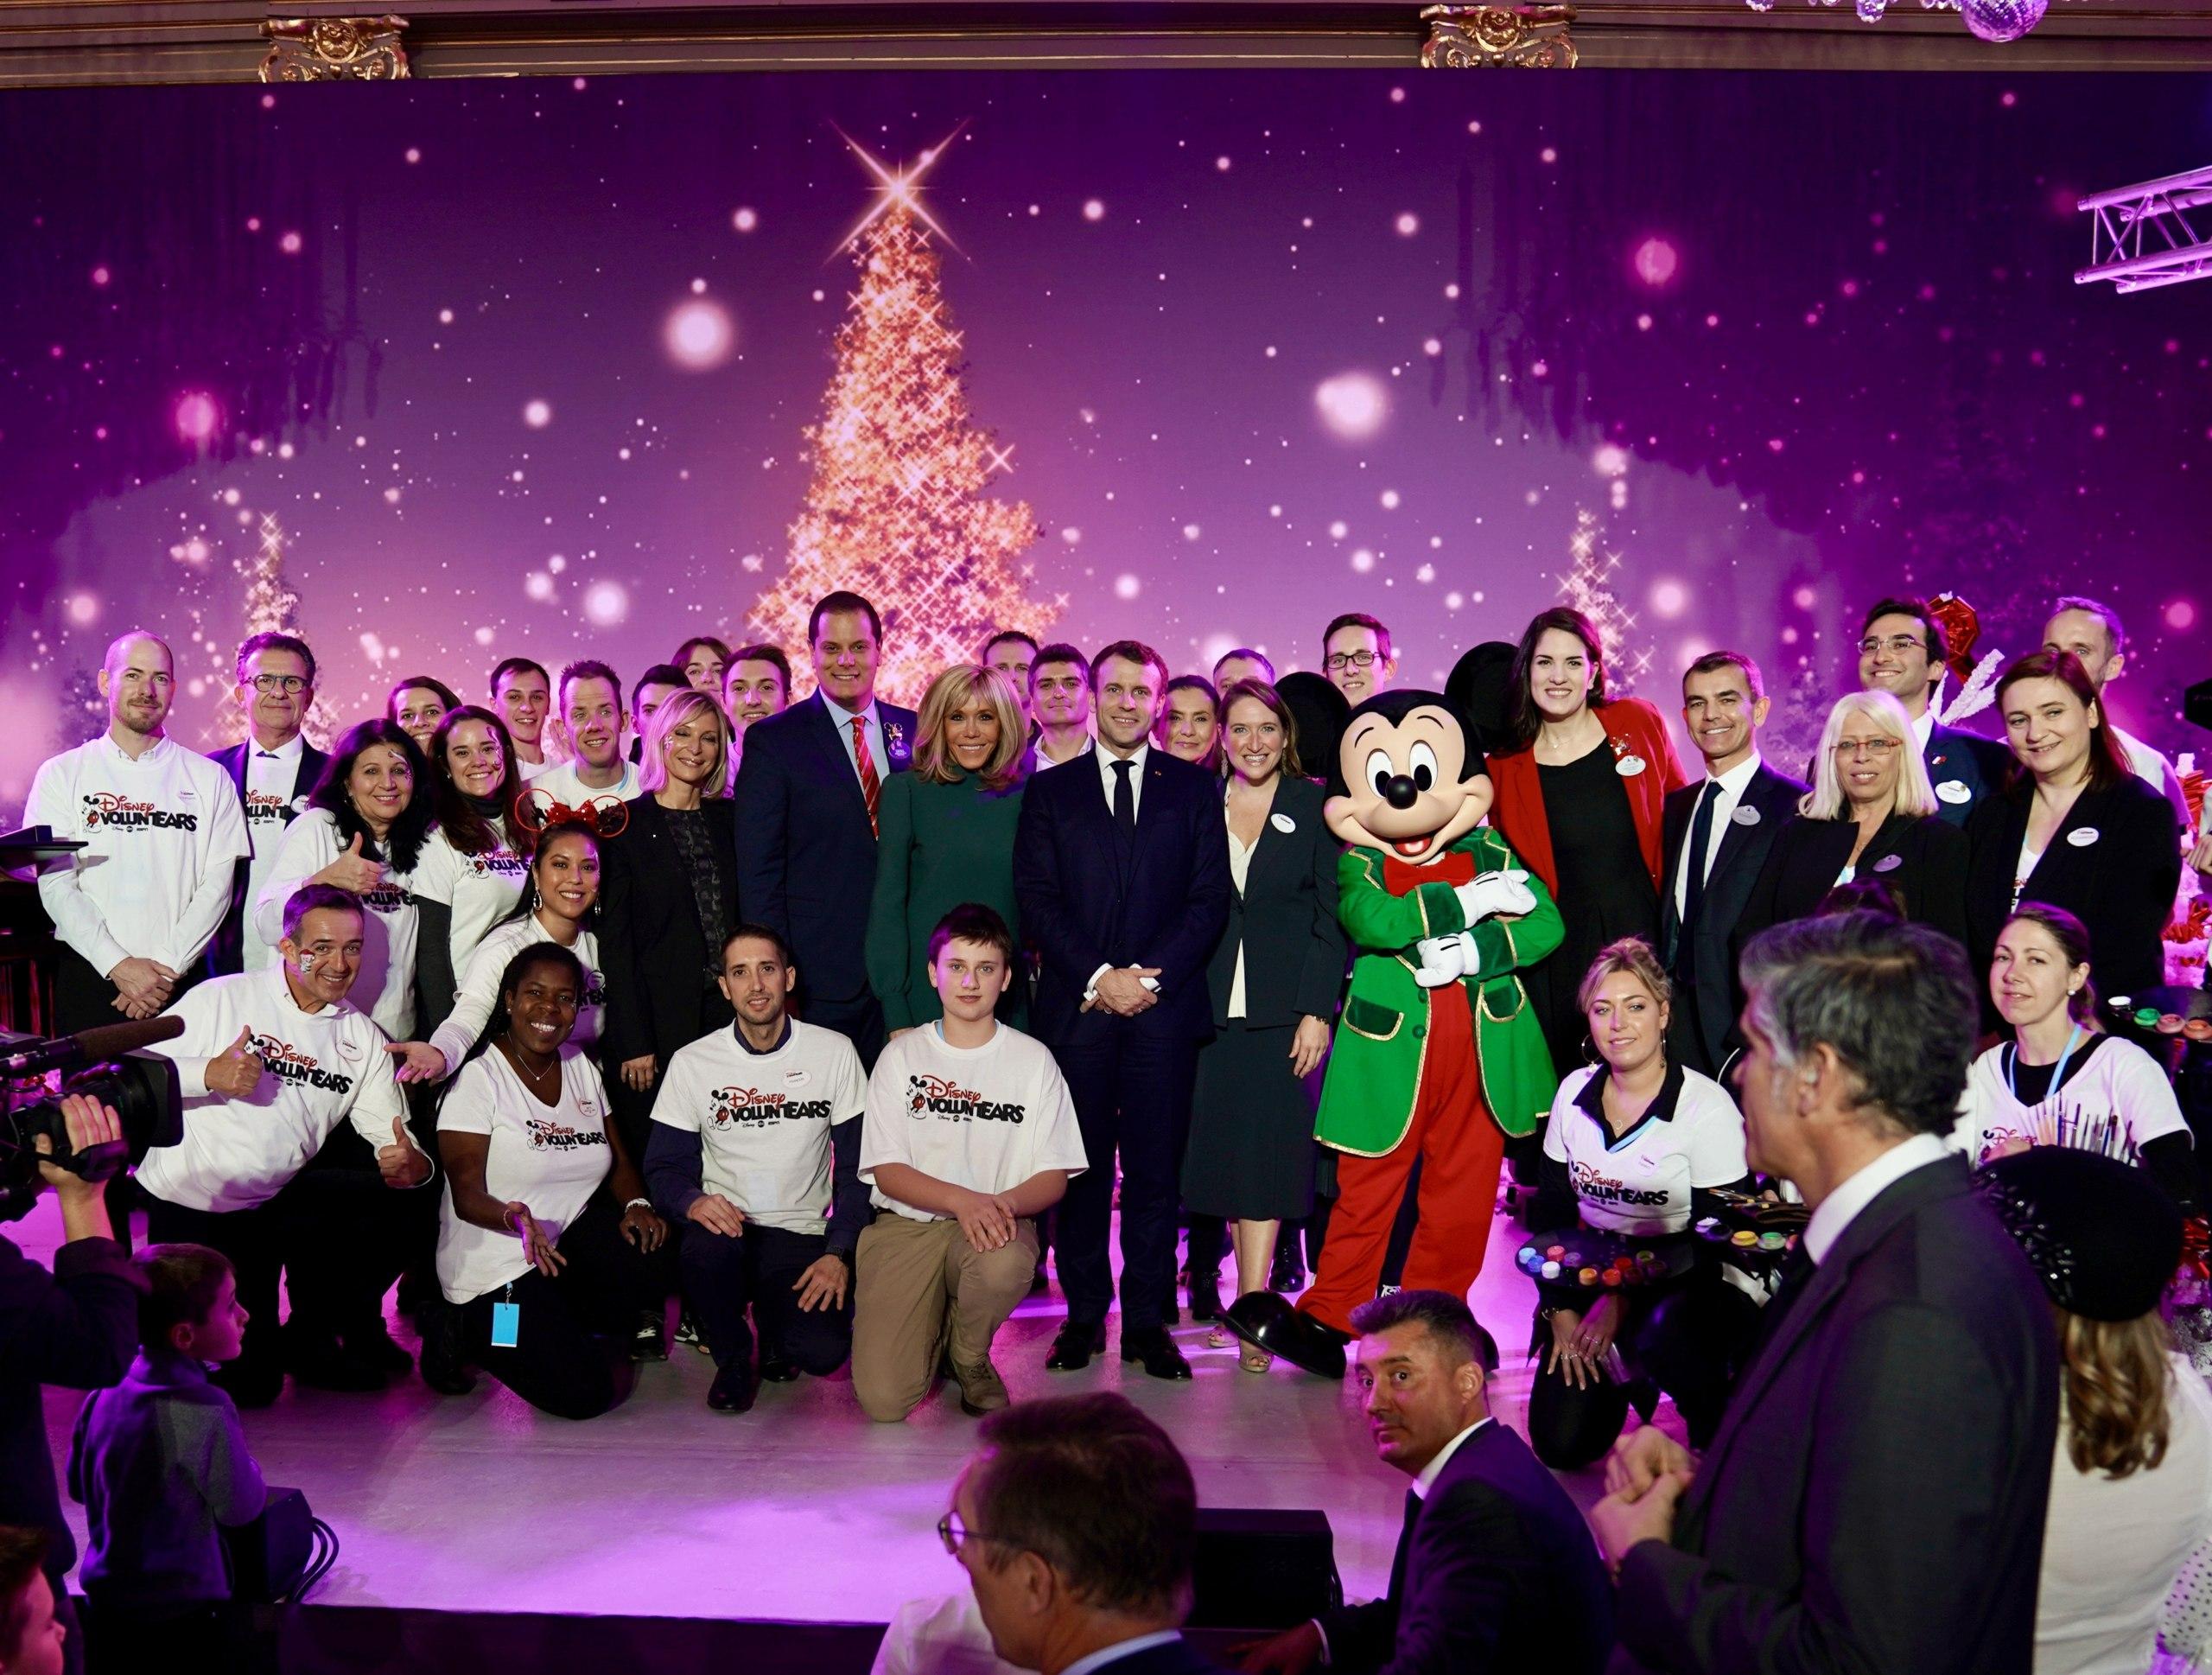 Ambasciatori Disneyland Paris 2019 - 2020 - Pagina 4 Elyszo10